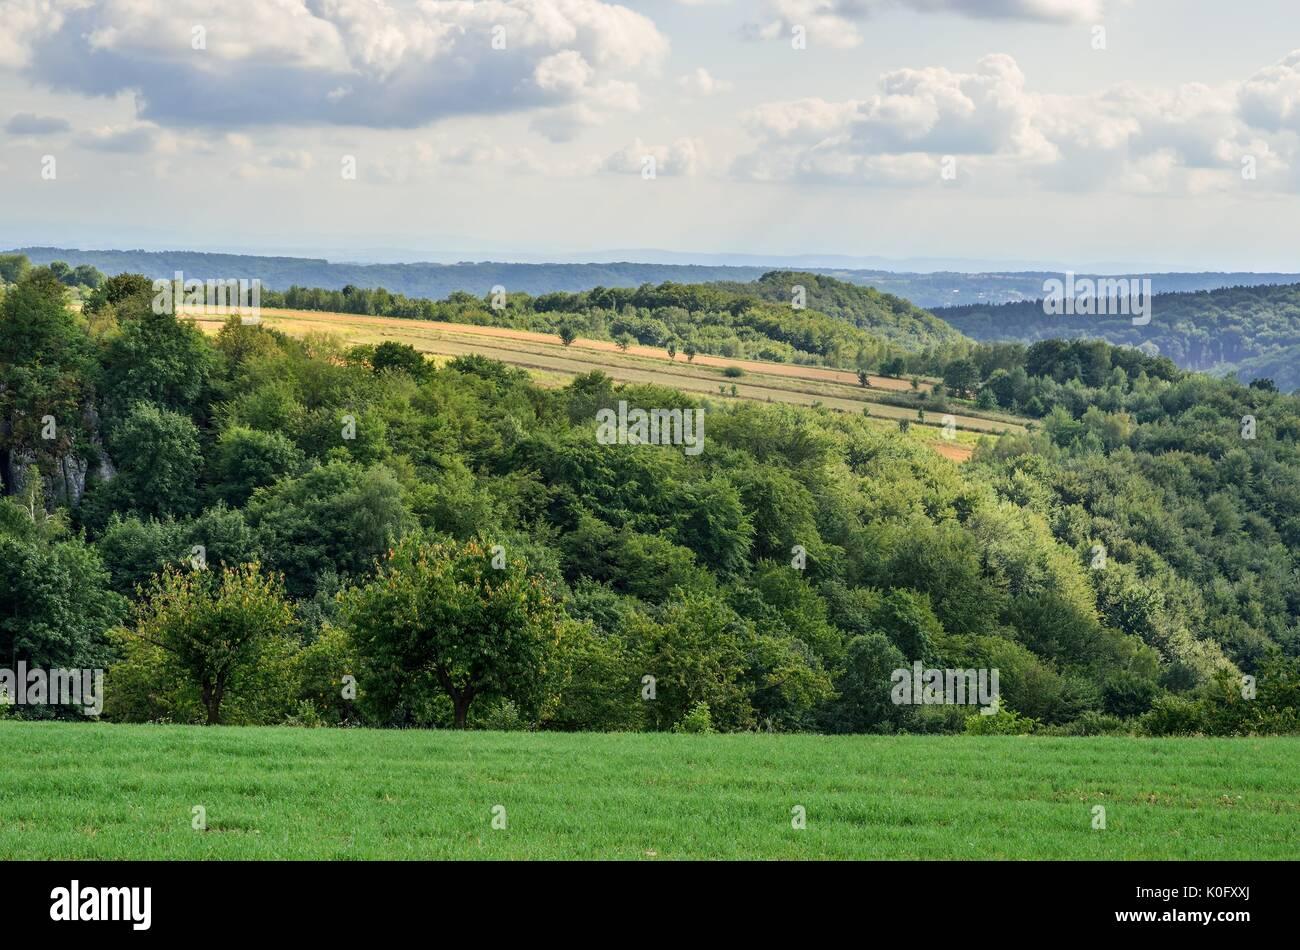 Summer hills landscape. Beautiful green Jurassic hills in Poland. - Stock Image